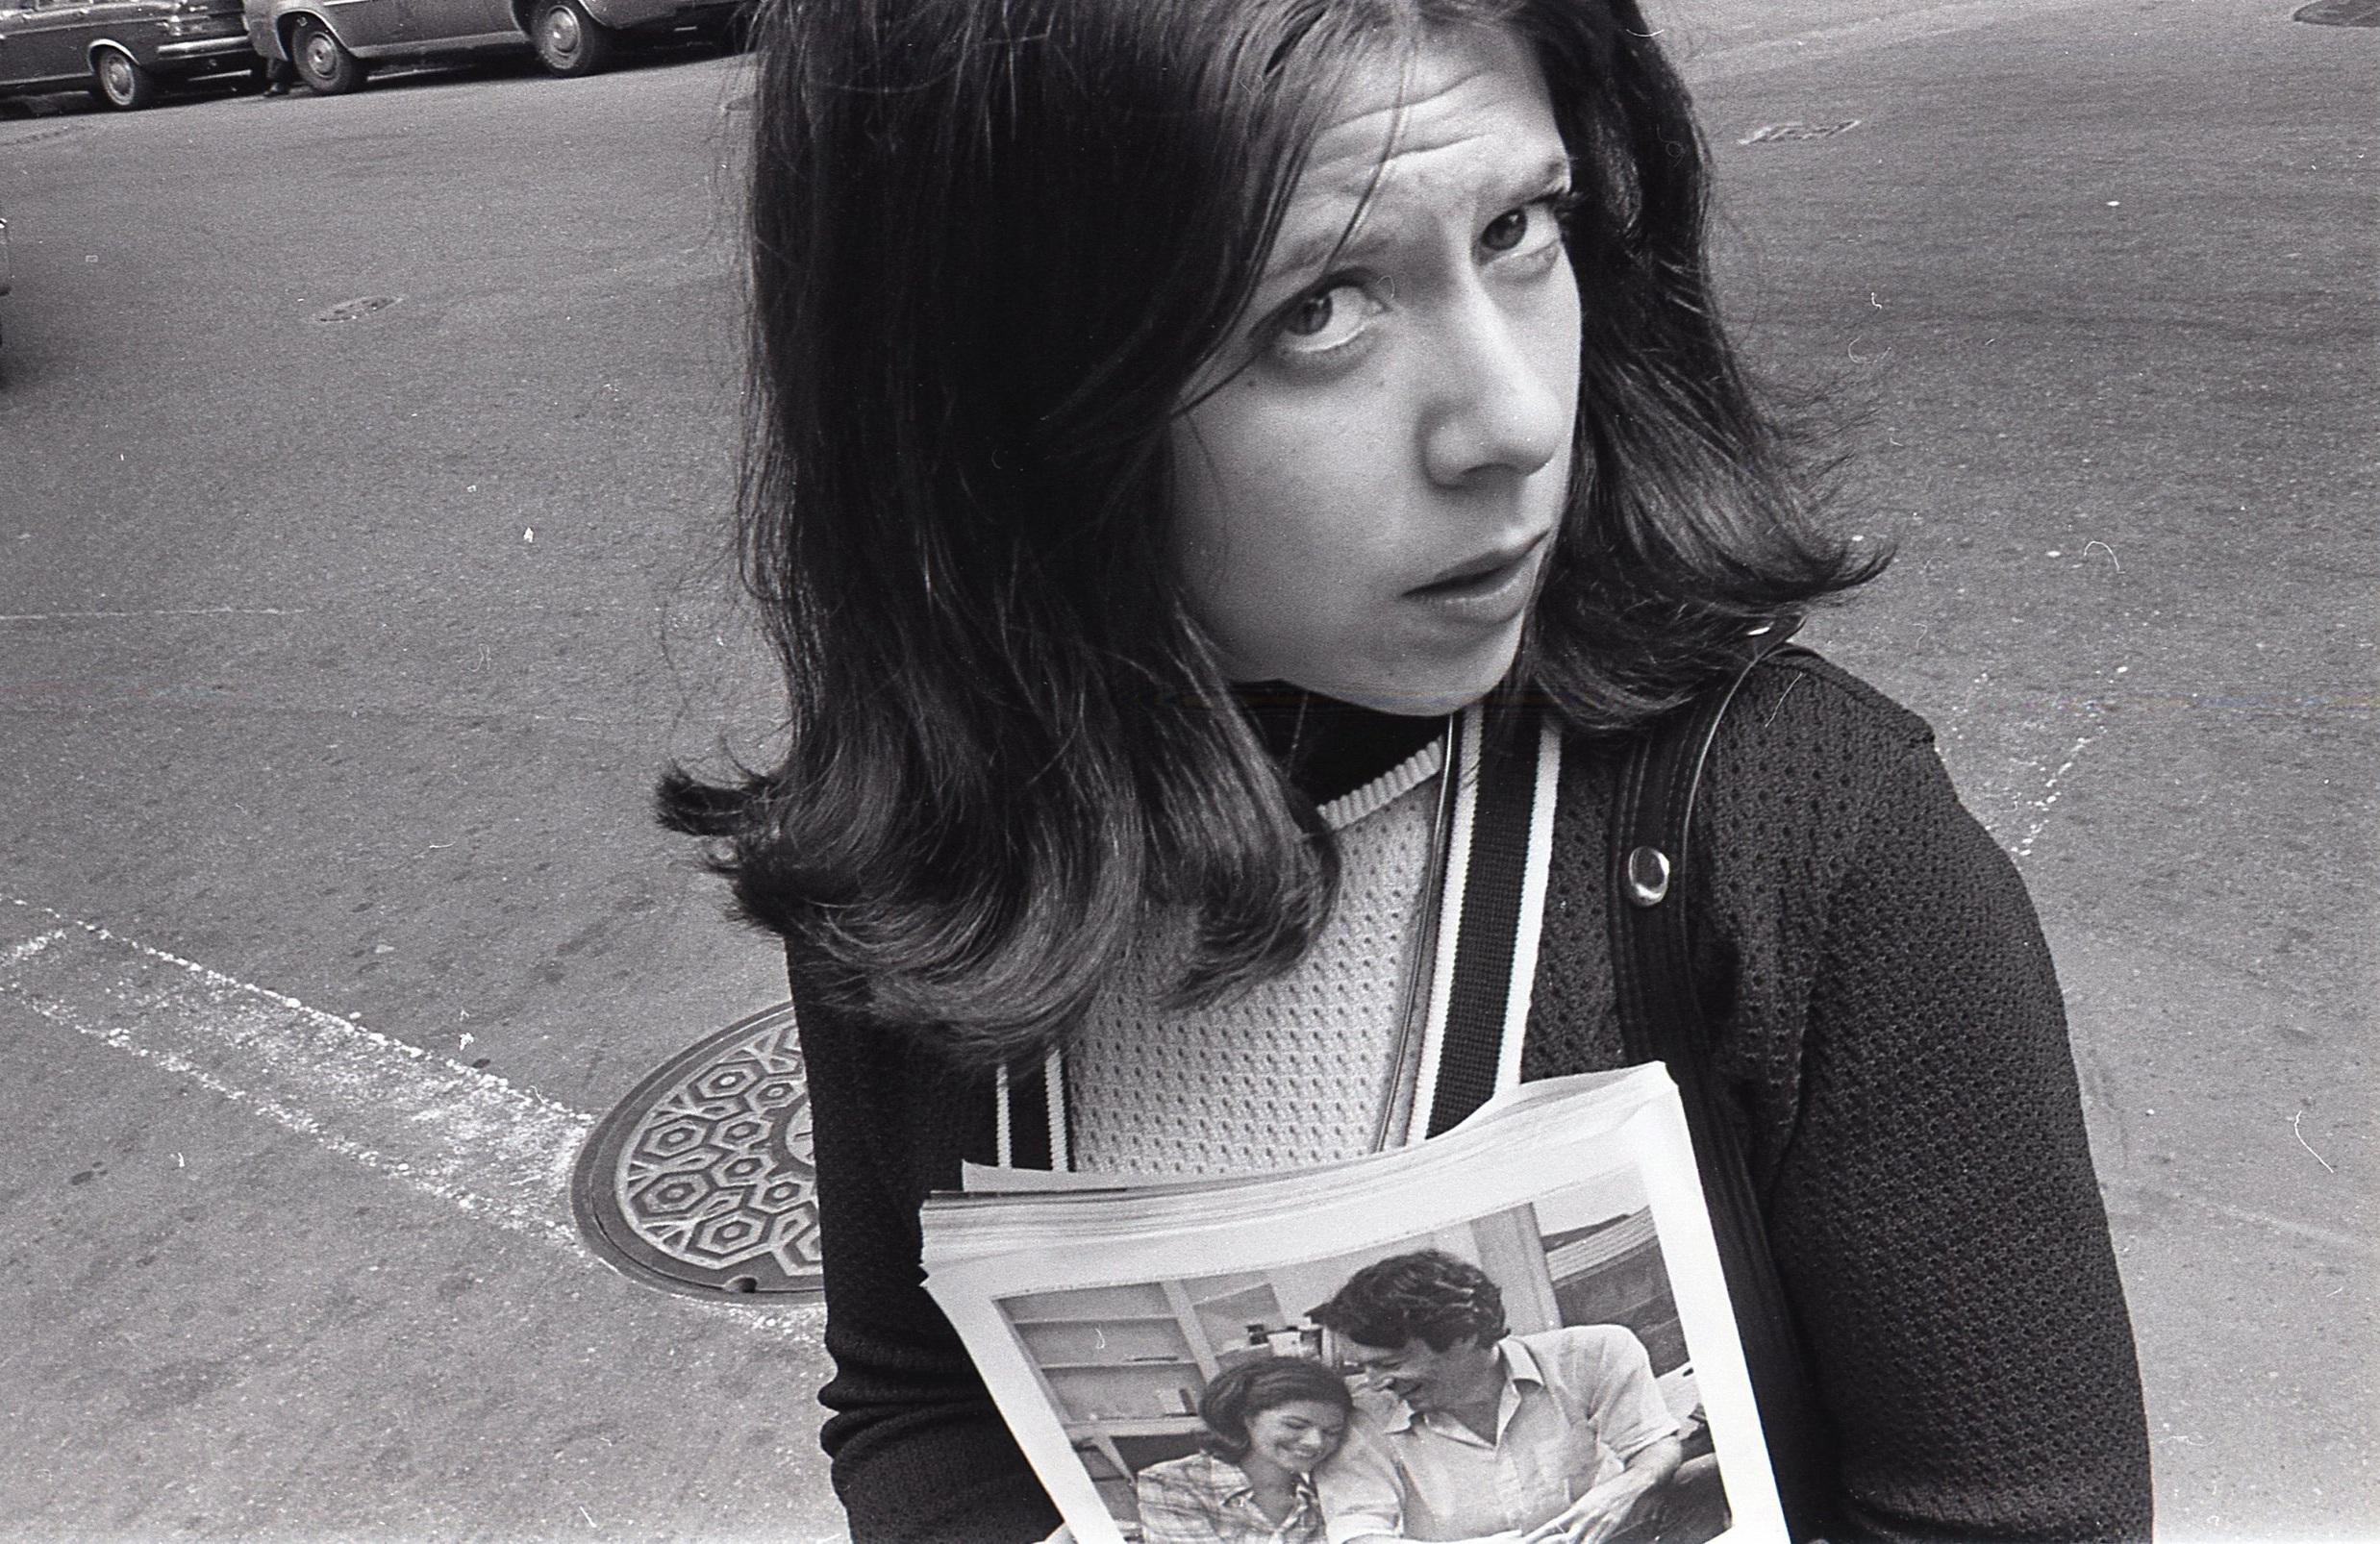 Girl With Magazine, Boston 1974